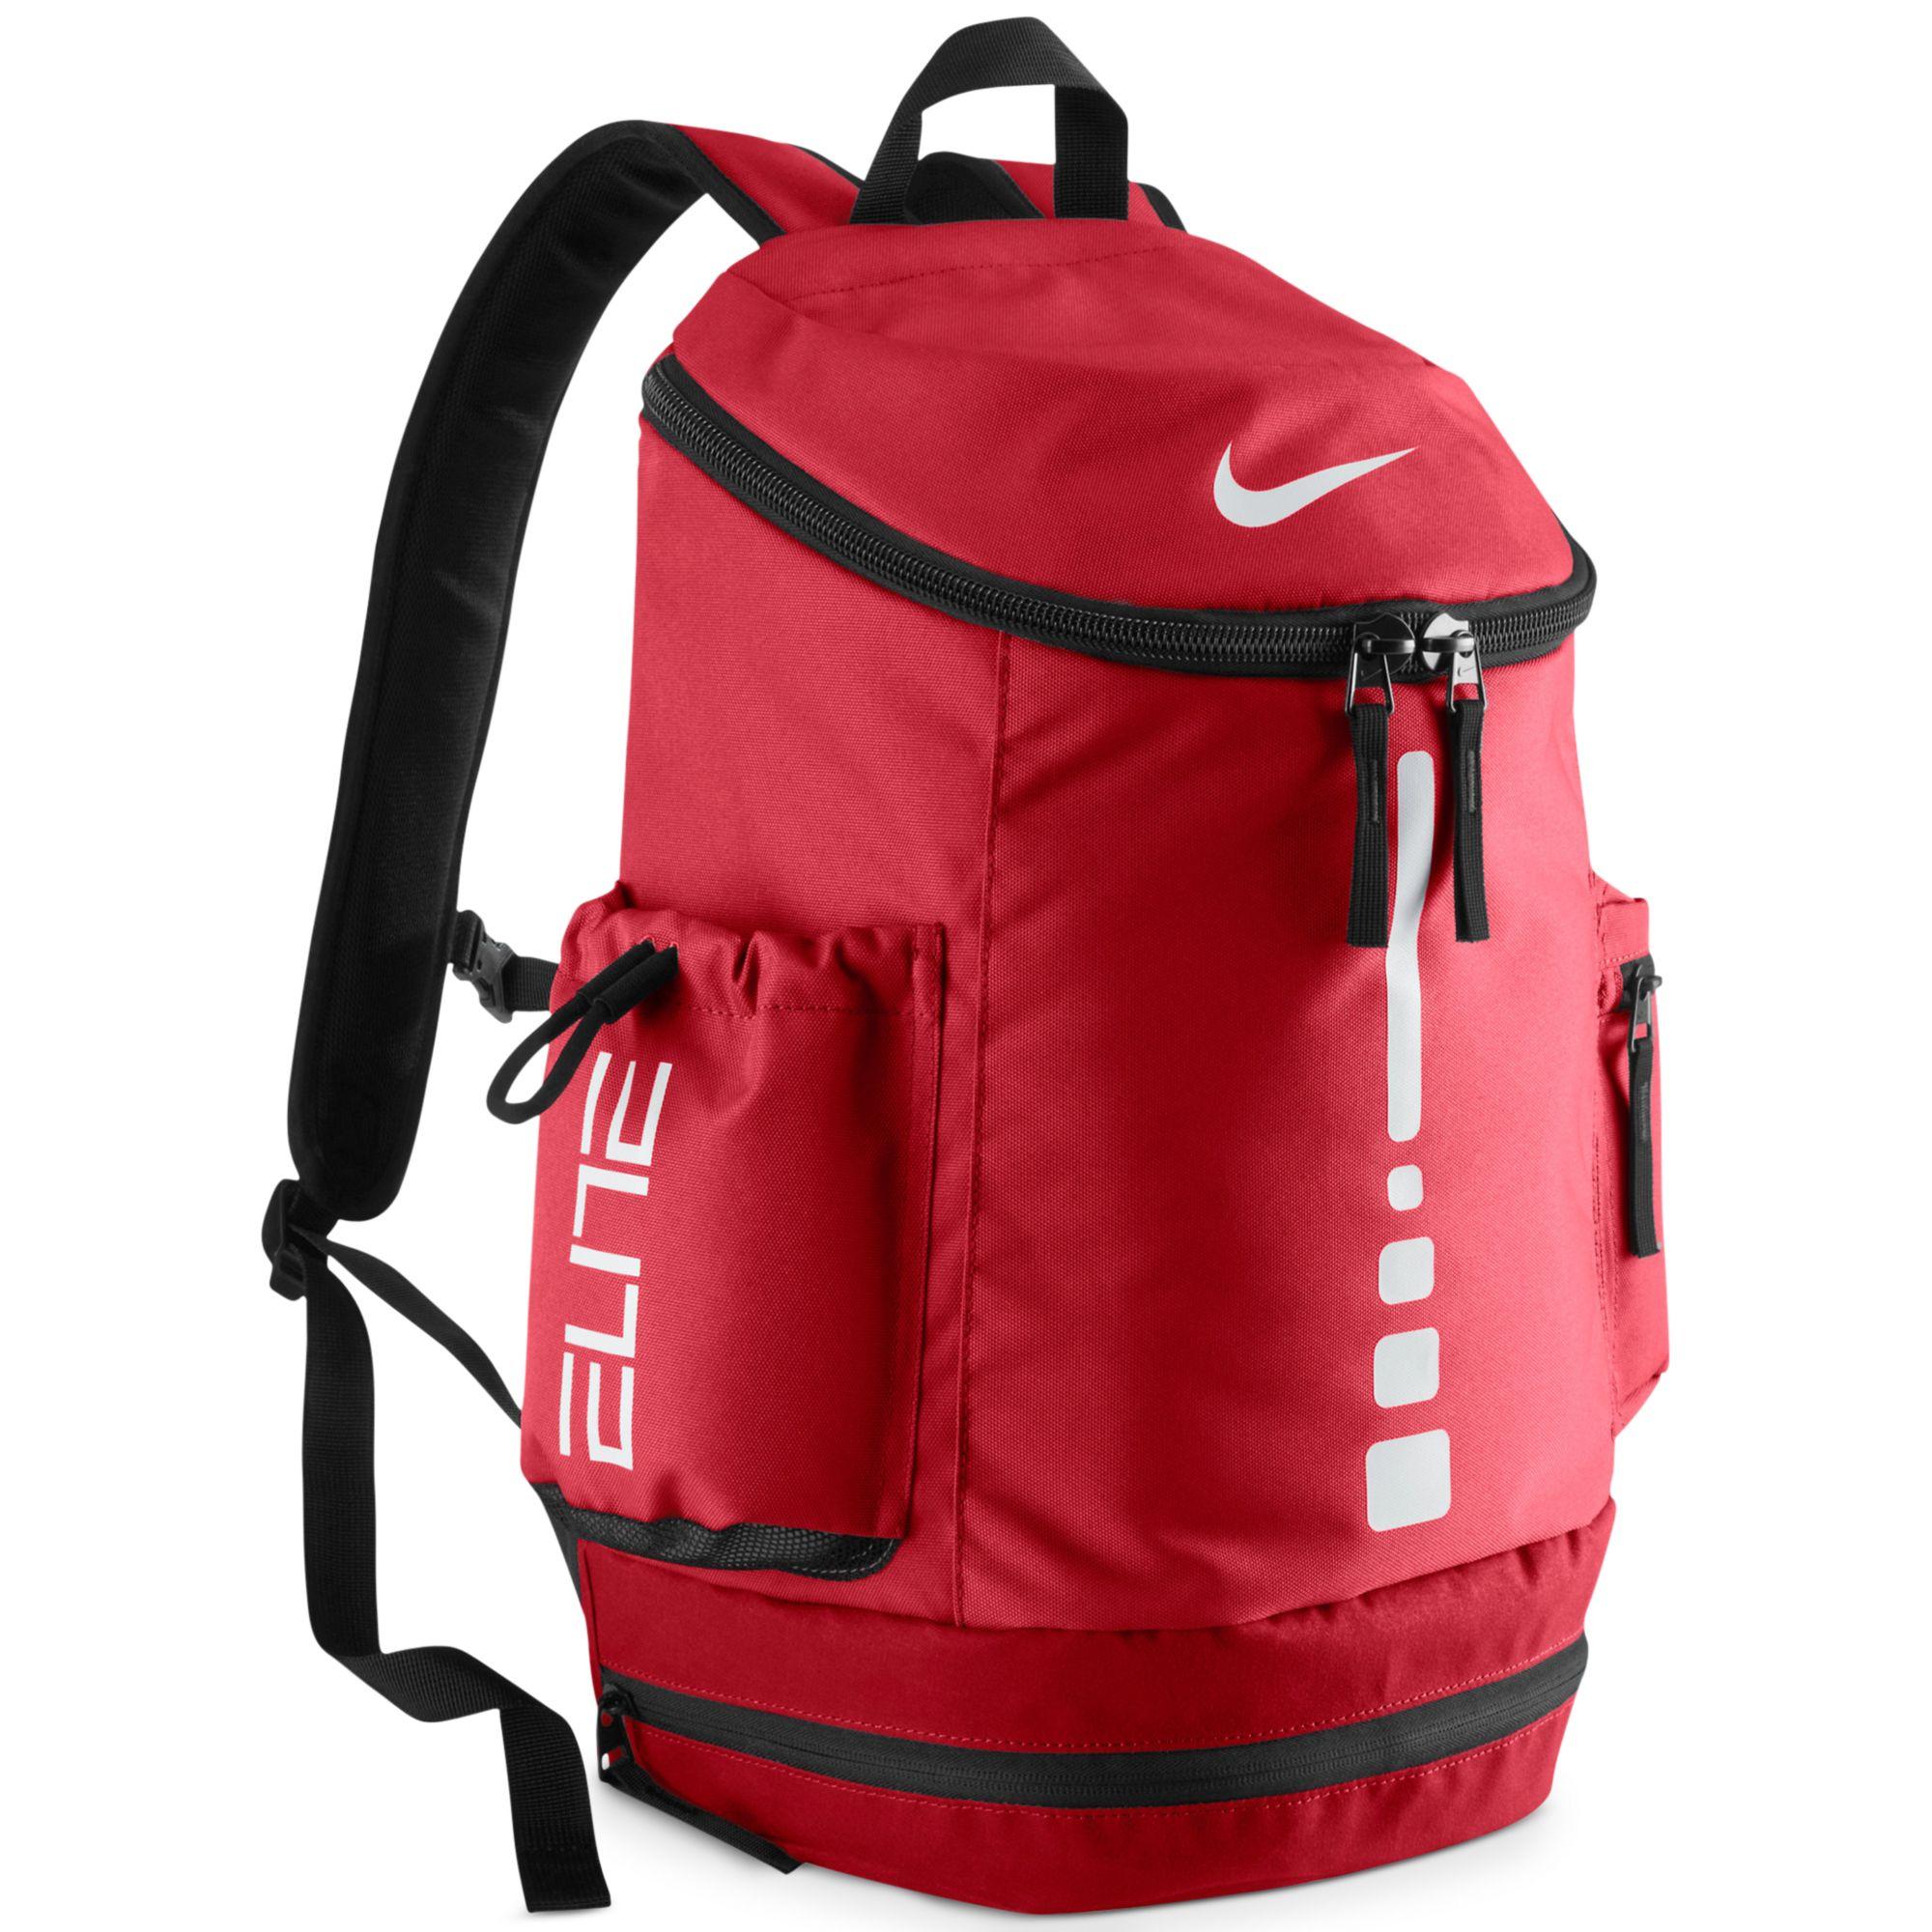 afcdd69de7 Lyst - Nike Hoops Elite Team Backpack in Red for Men